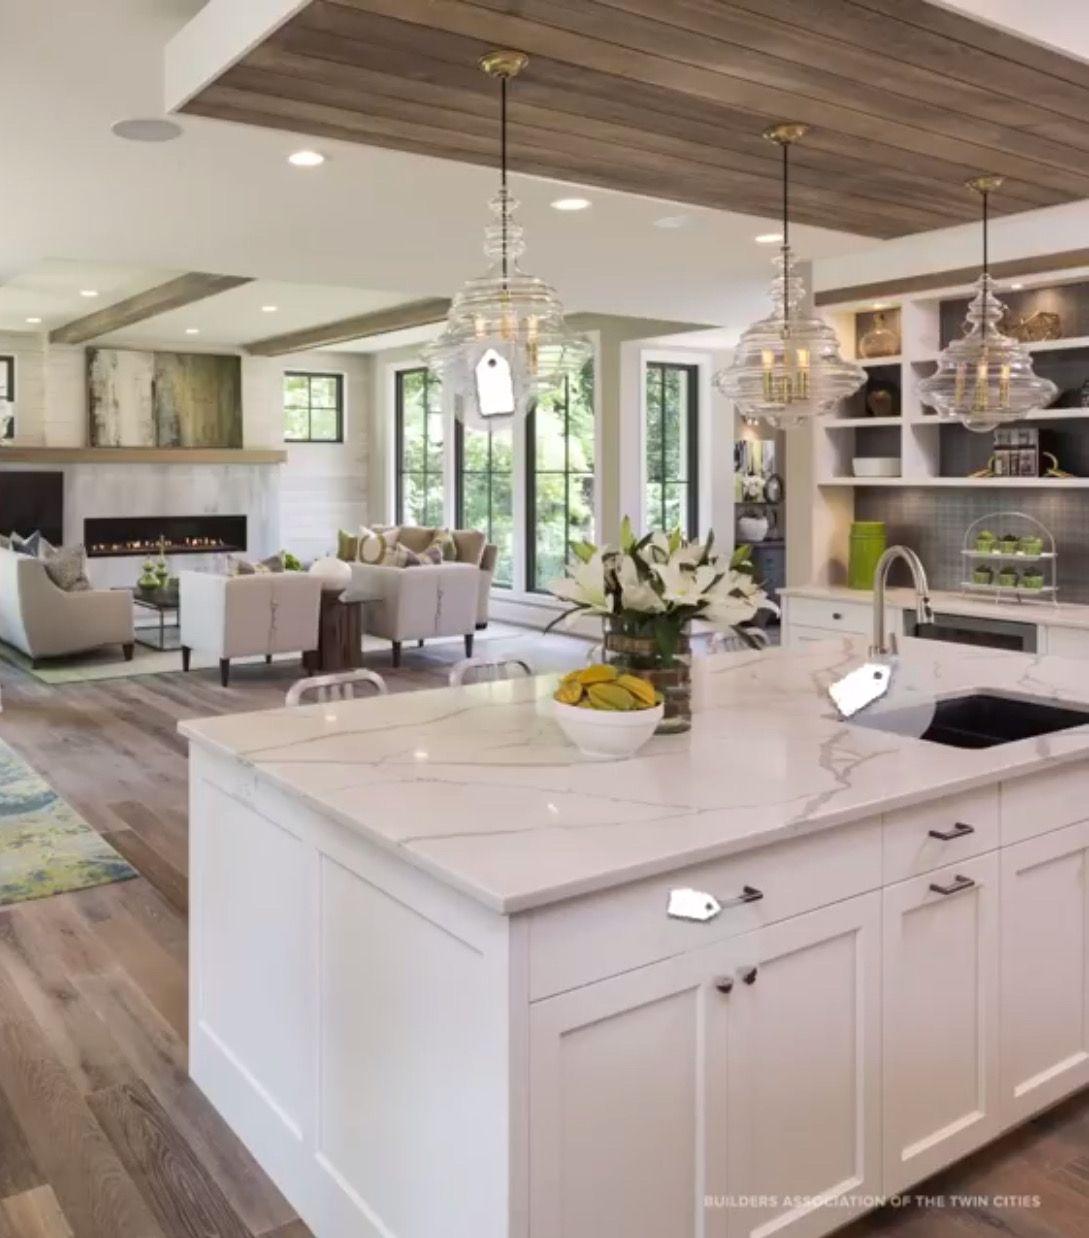 Lights | Farmhouse kitchen design, Open concept kitchen ...